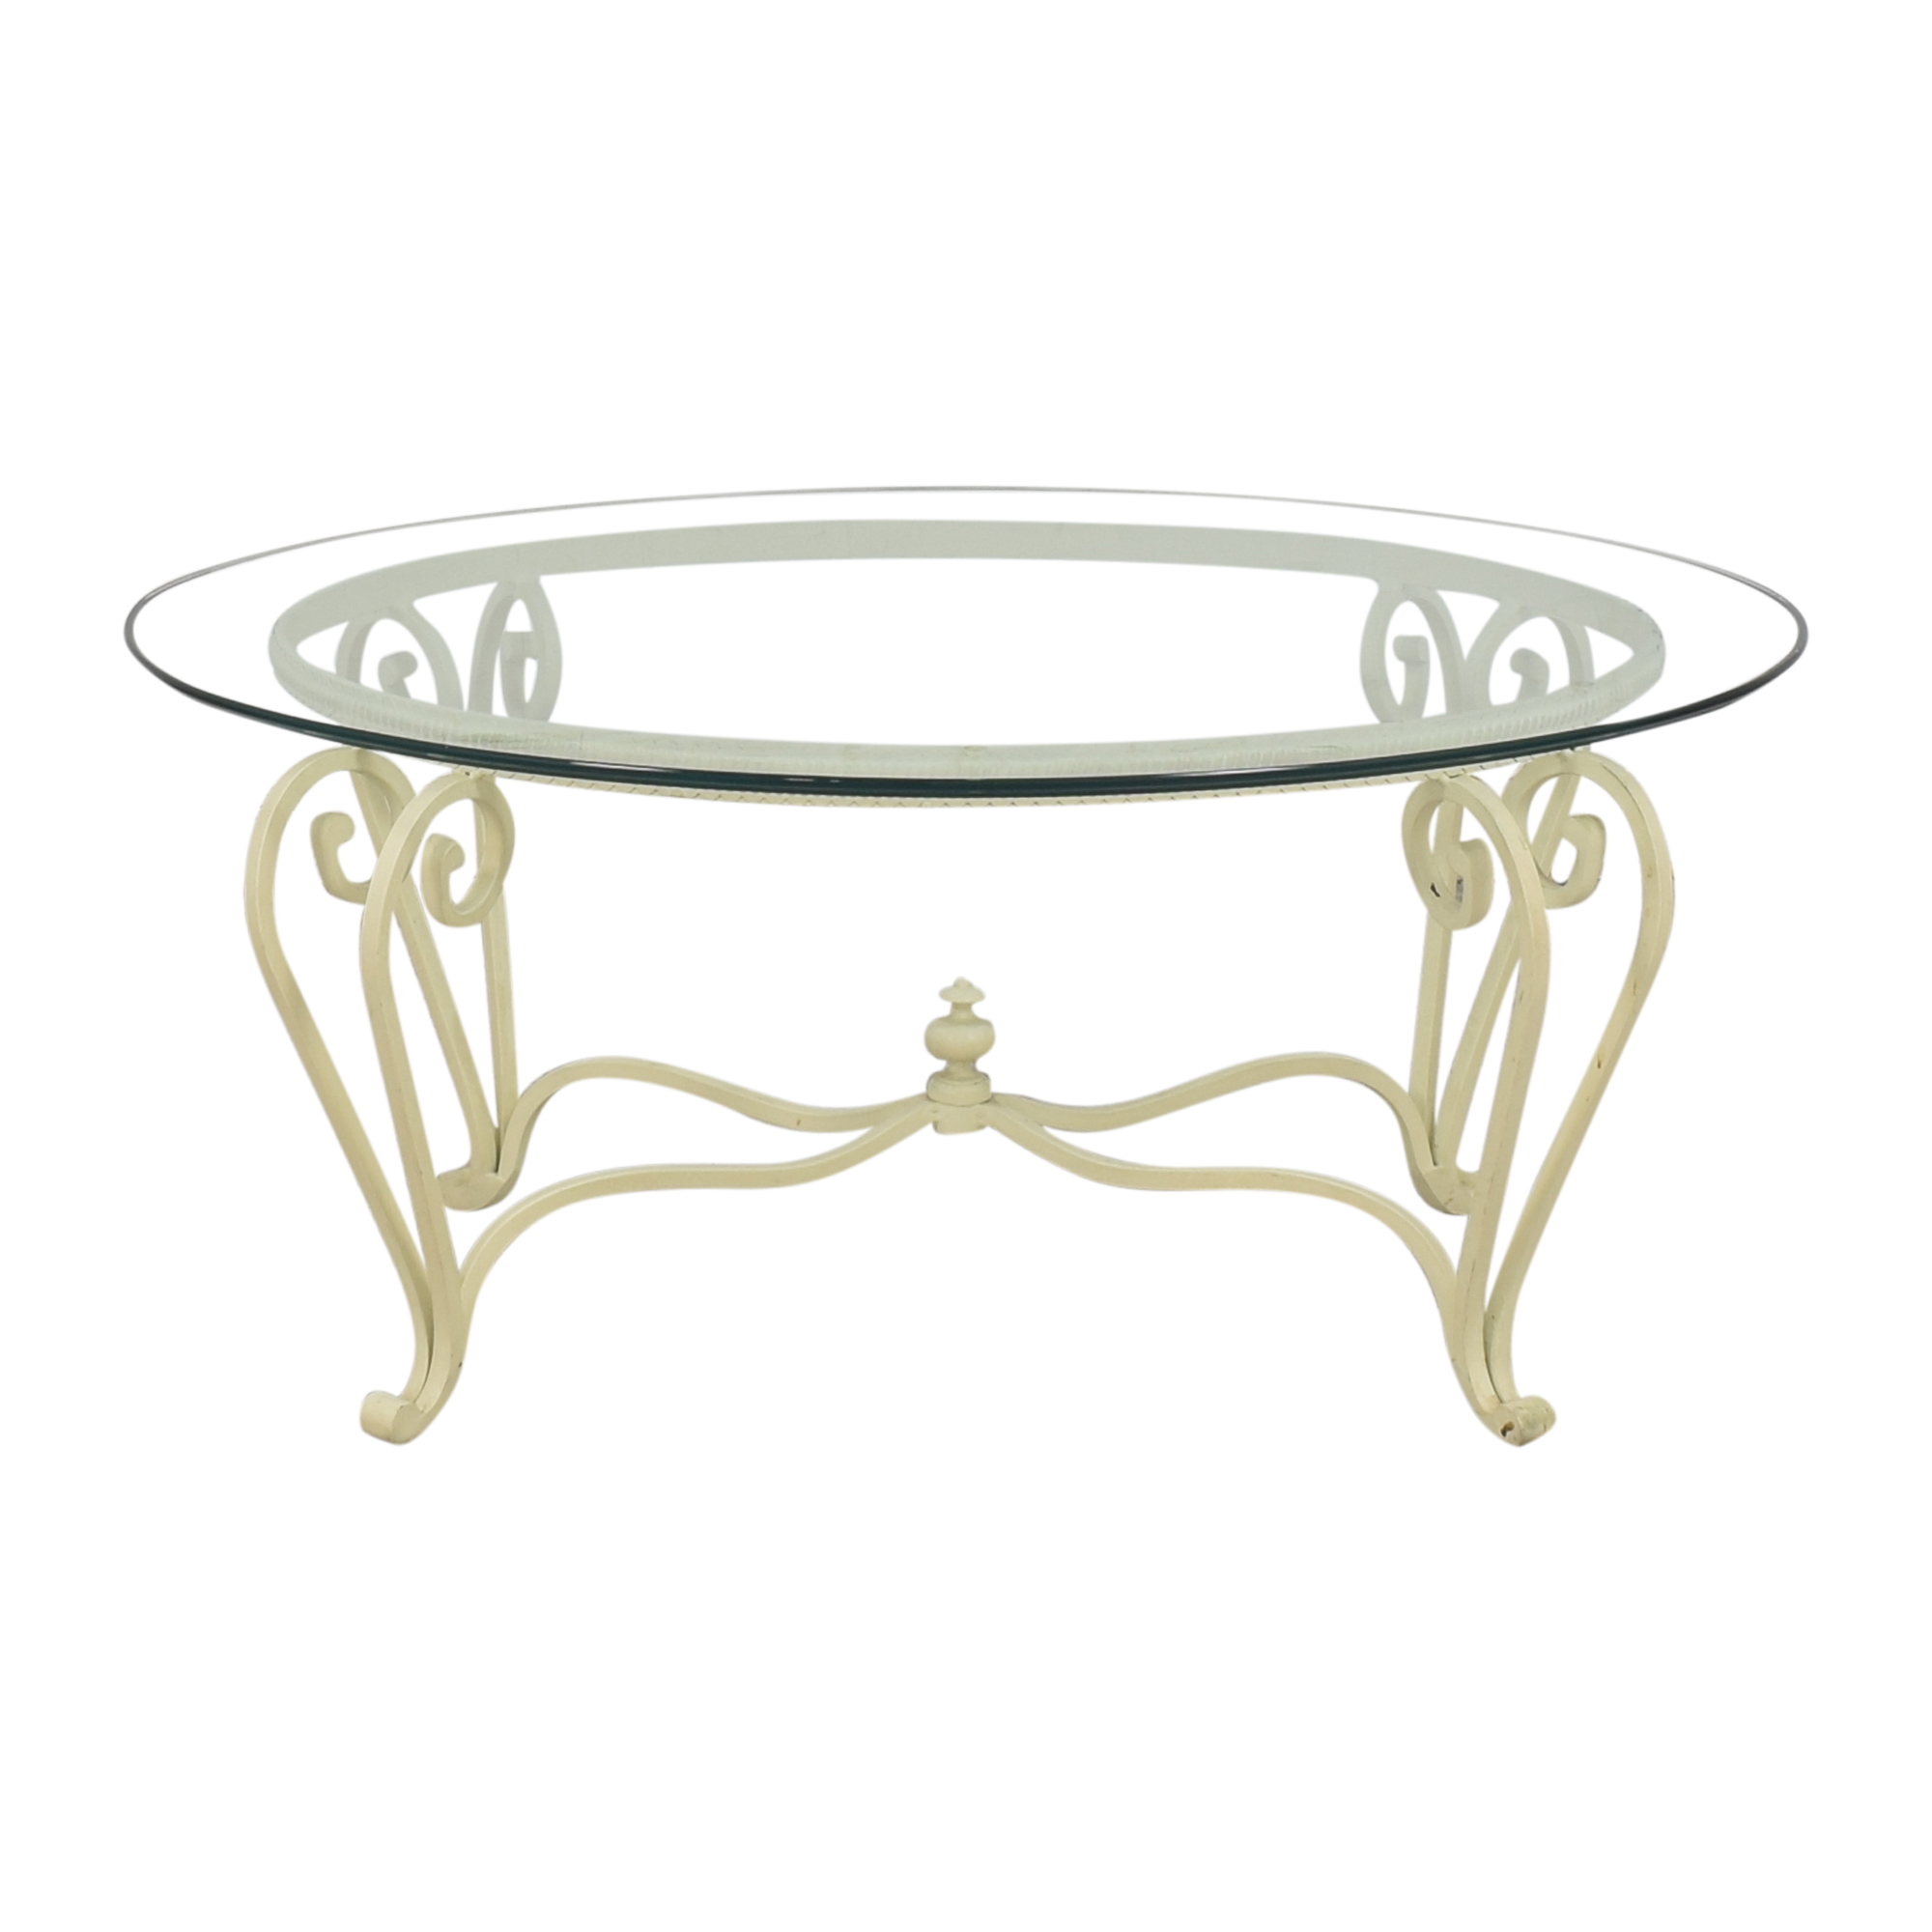 Ethan Allen Oval Coffee Table sale